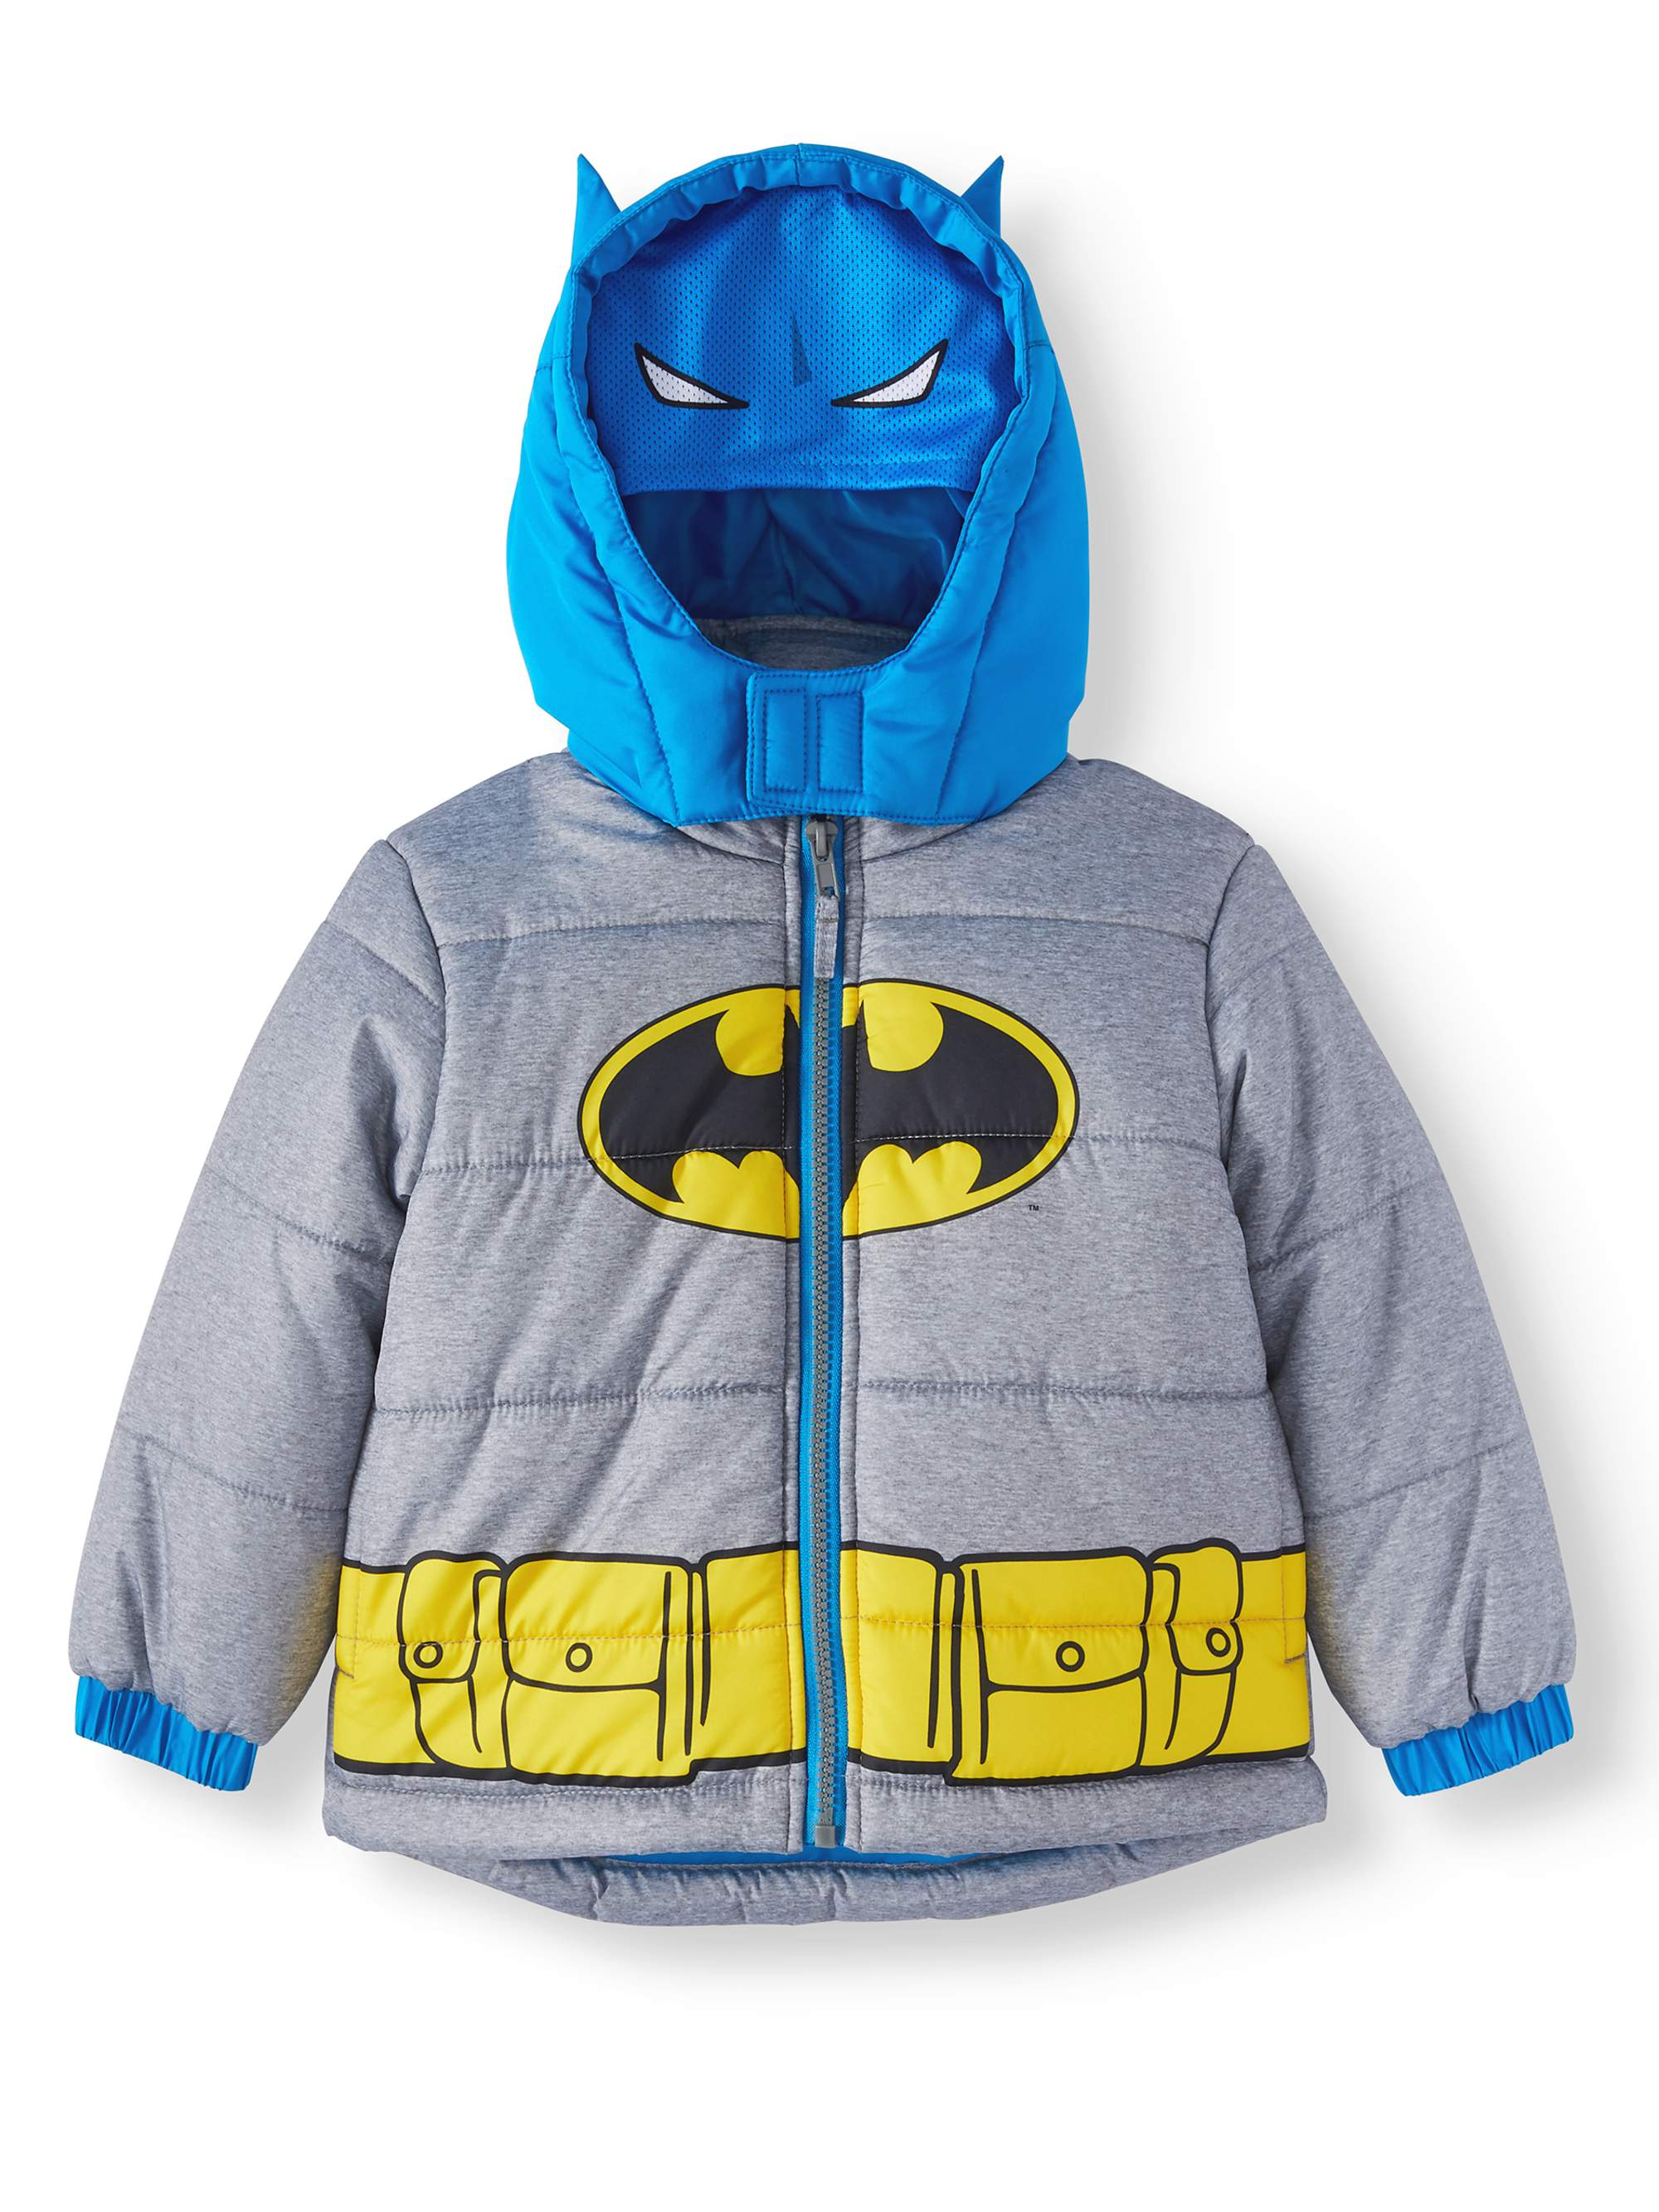 Batman Costume Puffer Jacket Coat (Toddler Boys)